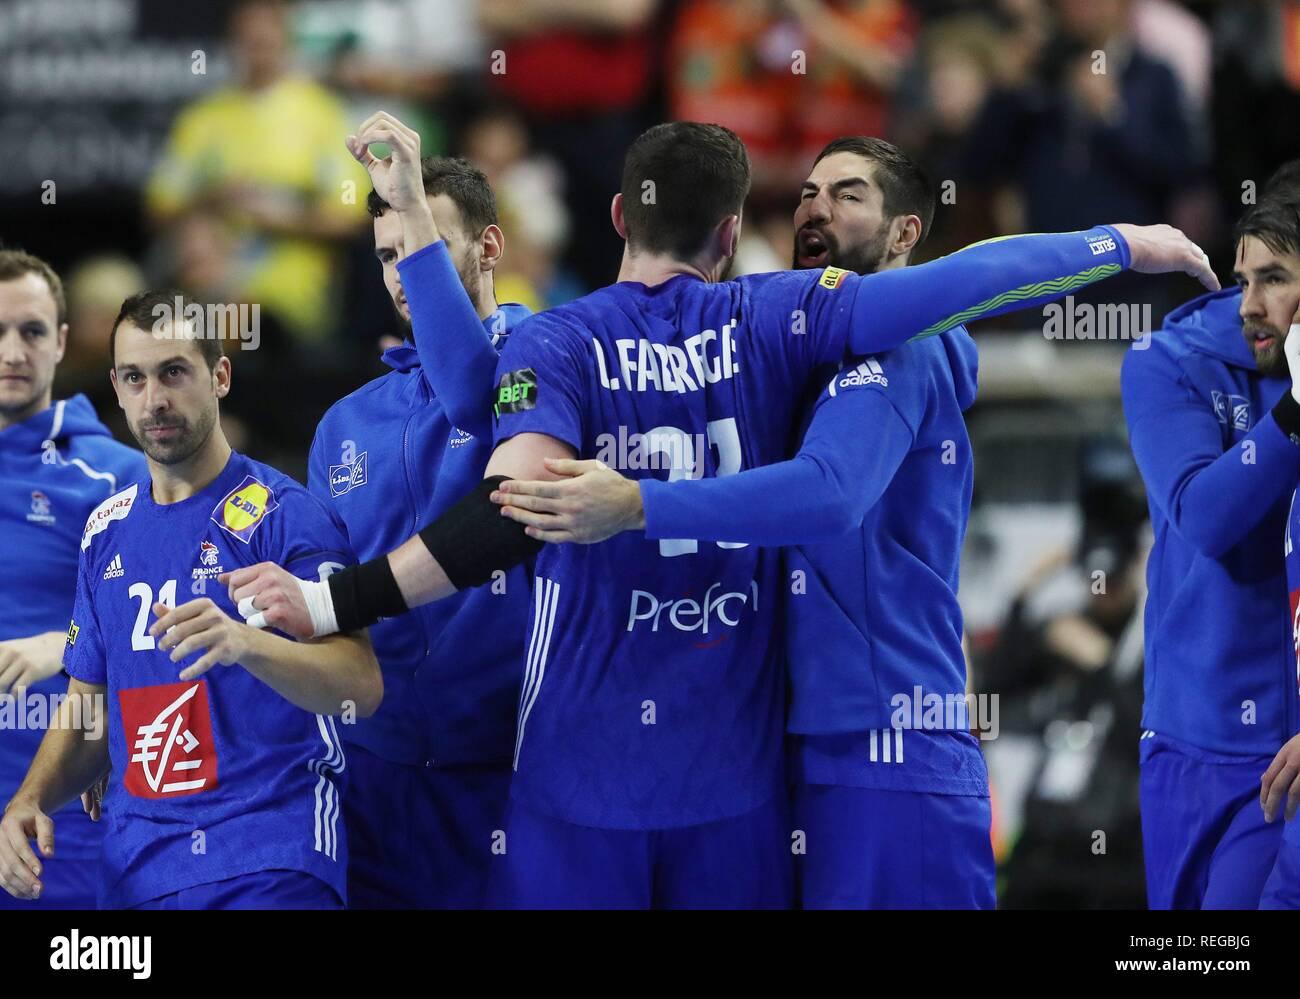 firo: 19.01.2019, Handball: World Cup World Cup Main Round France - Spain Nikola Karabatic jubilation with Ludocic Fabregas   usage worldwide - Stock Image